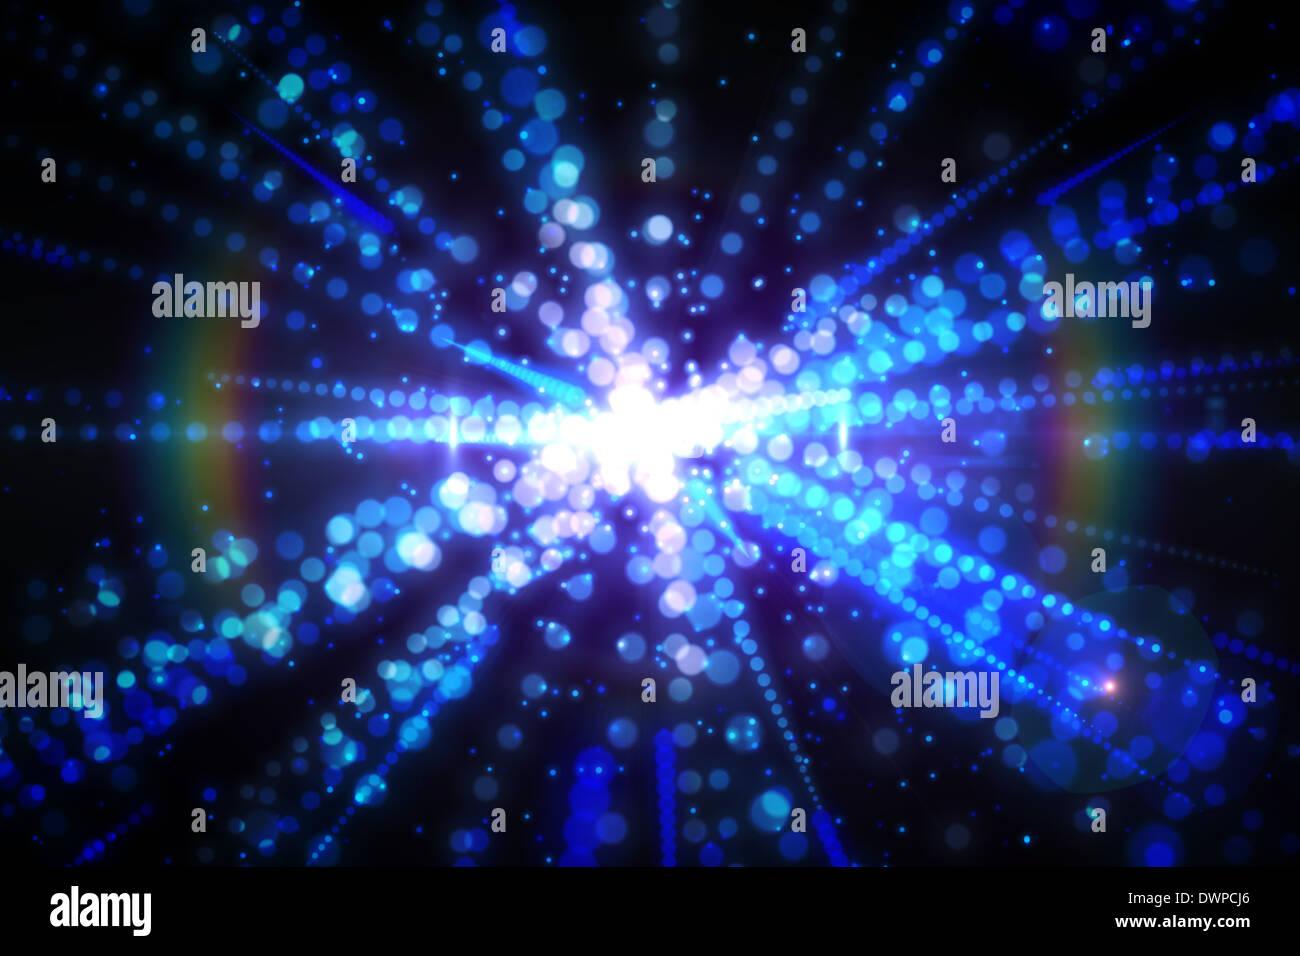 Digitally generated laser background - Stock Image